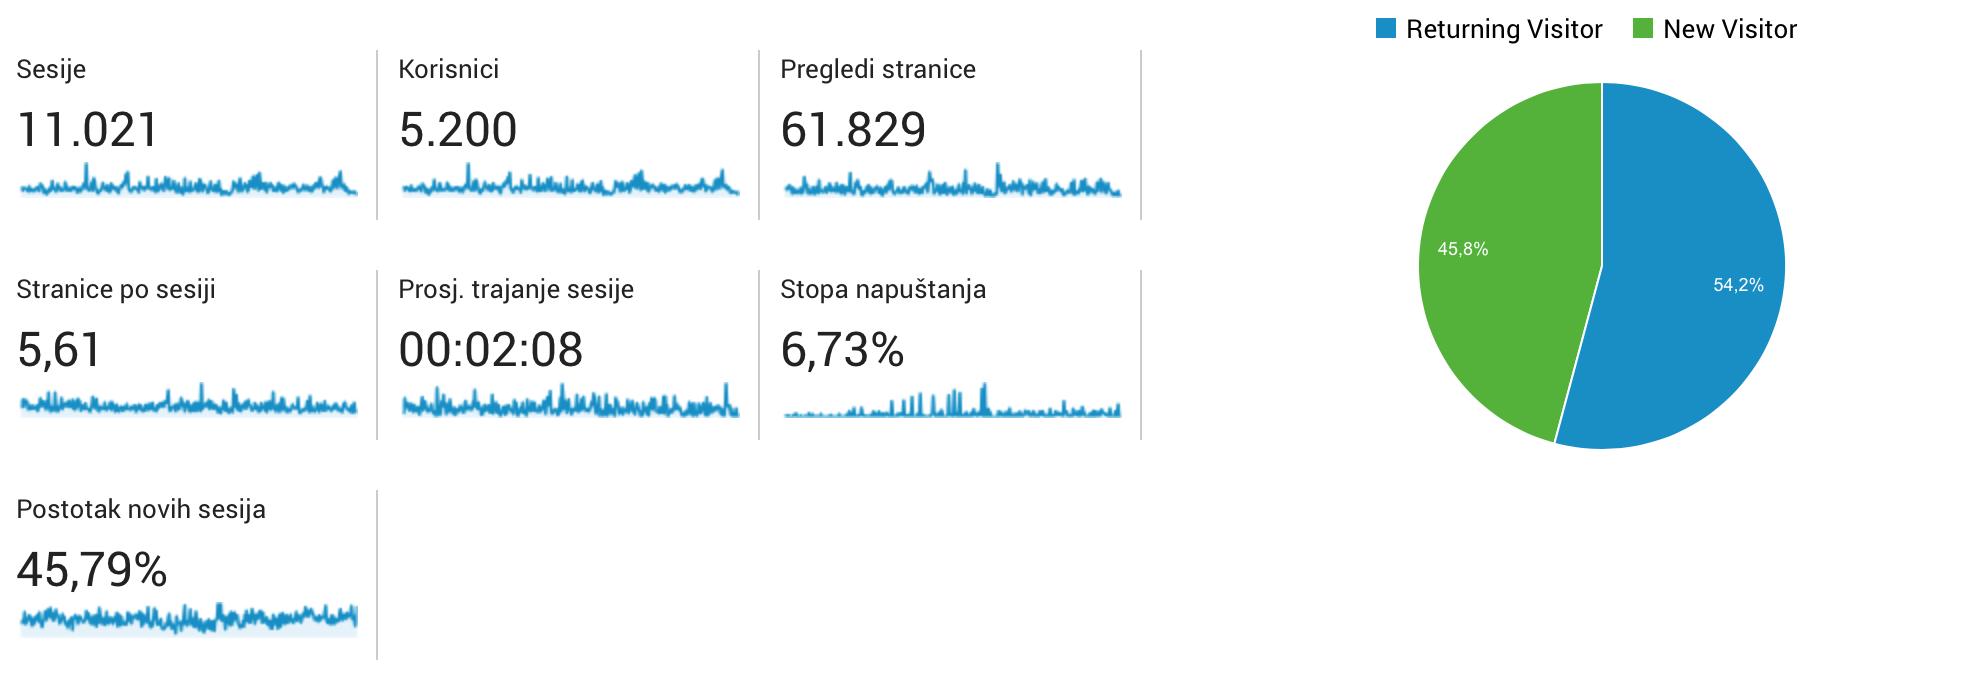 You are currently viewing Analiza posjećenosti portala u 2016. godini